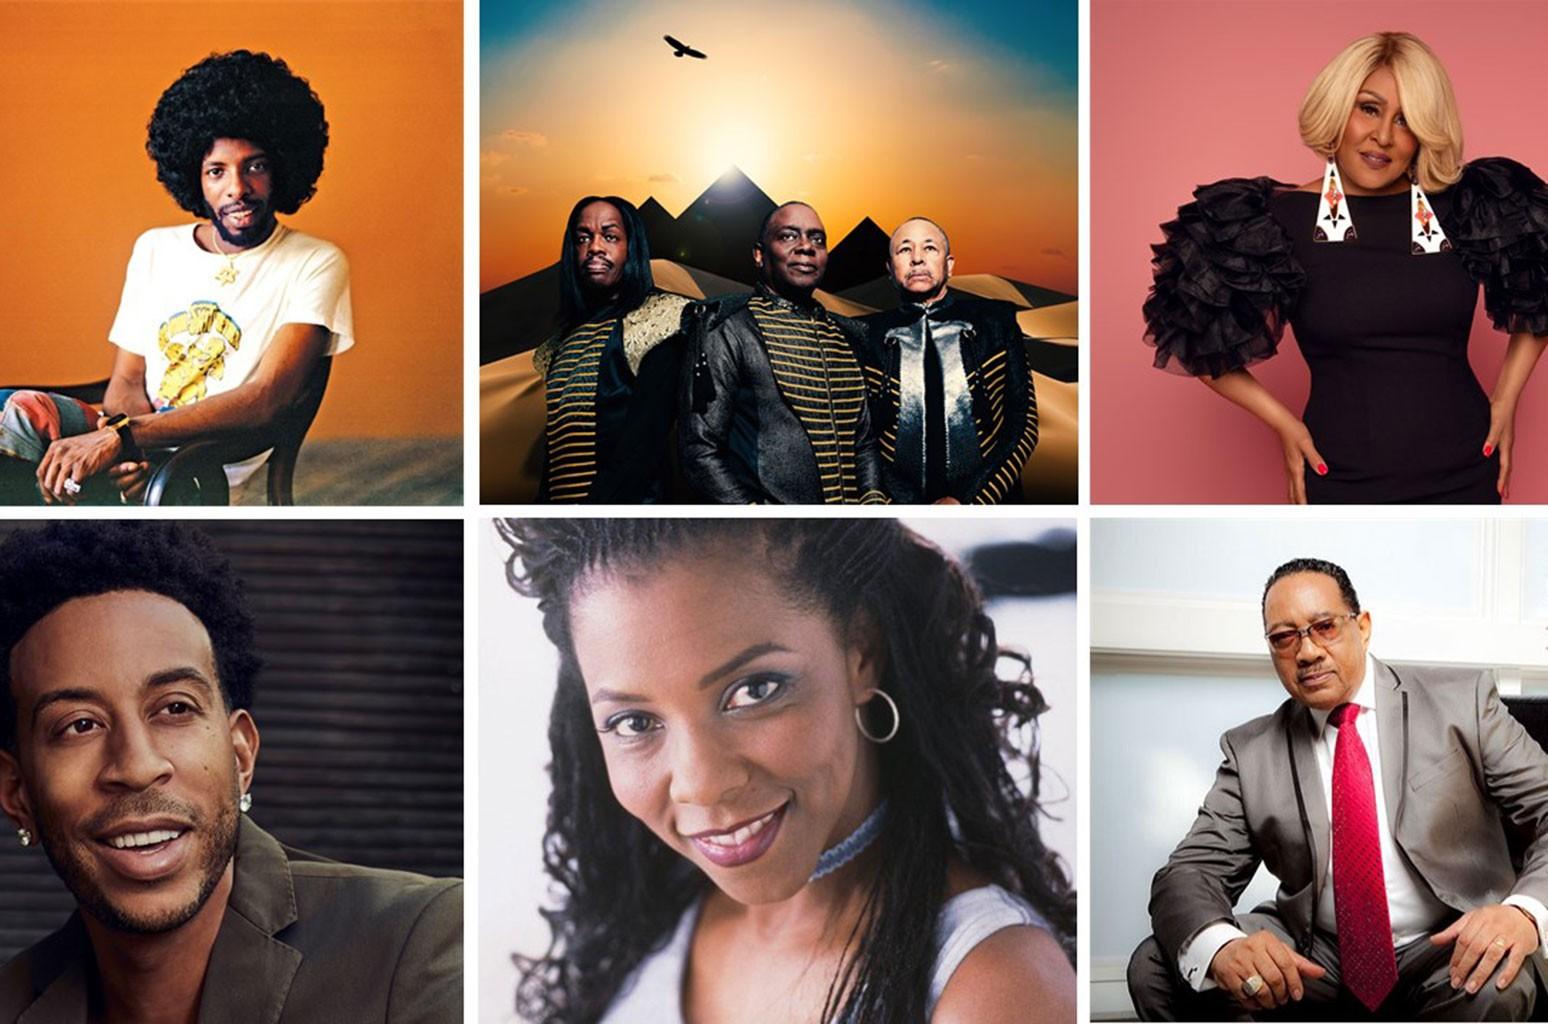 Sly Stone, Earth, Wind & Fire, Darlene Love, Ludacris, Patrice Rushen and Dr. Bobby Jones